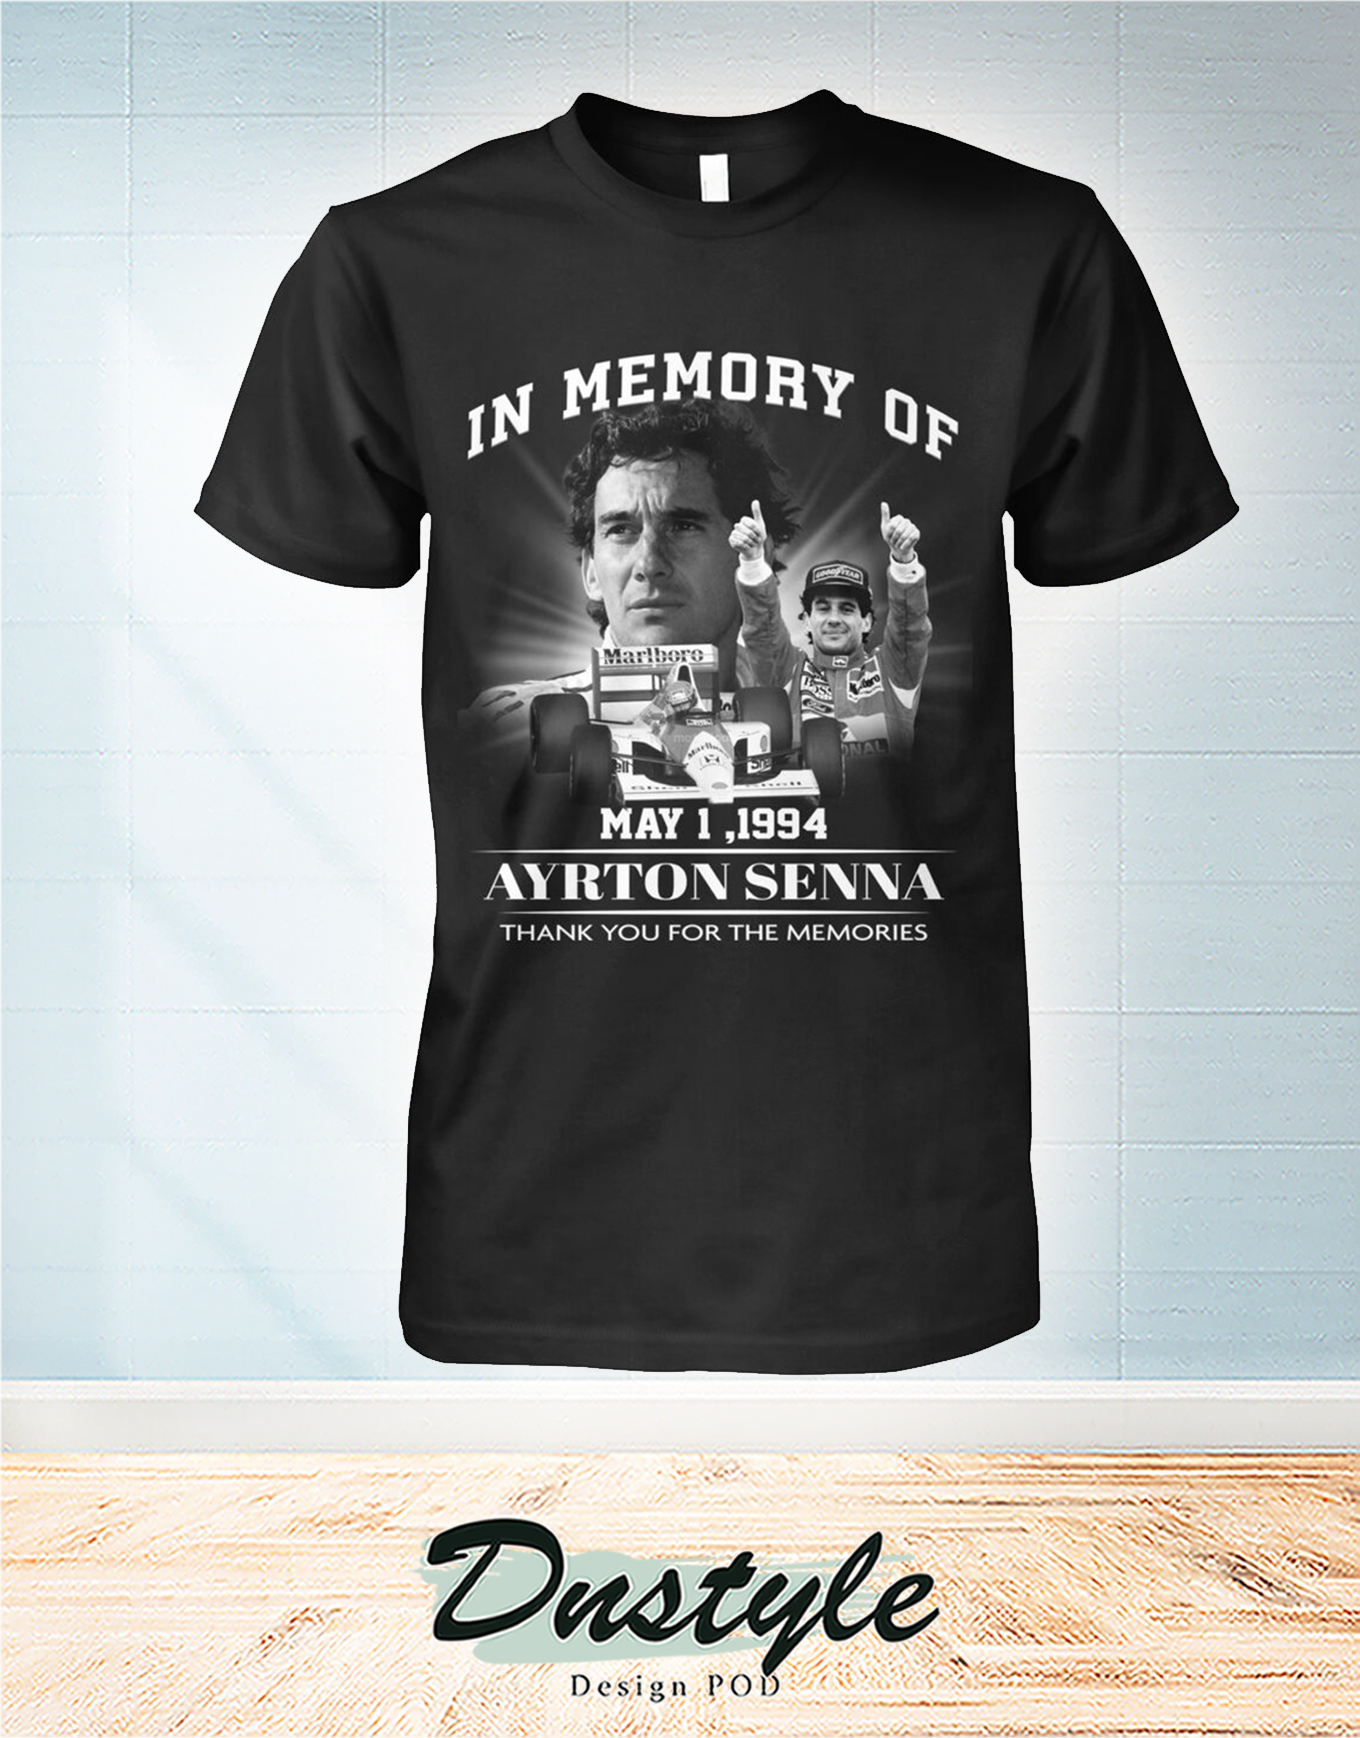 The doors In memory of Ayrton Senna may 1 1994 thank you for the memories shirt